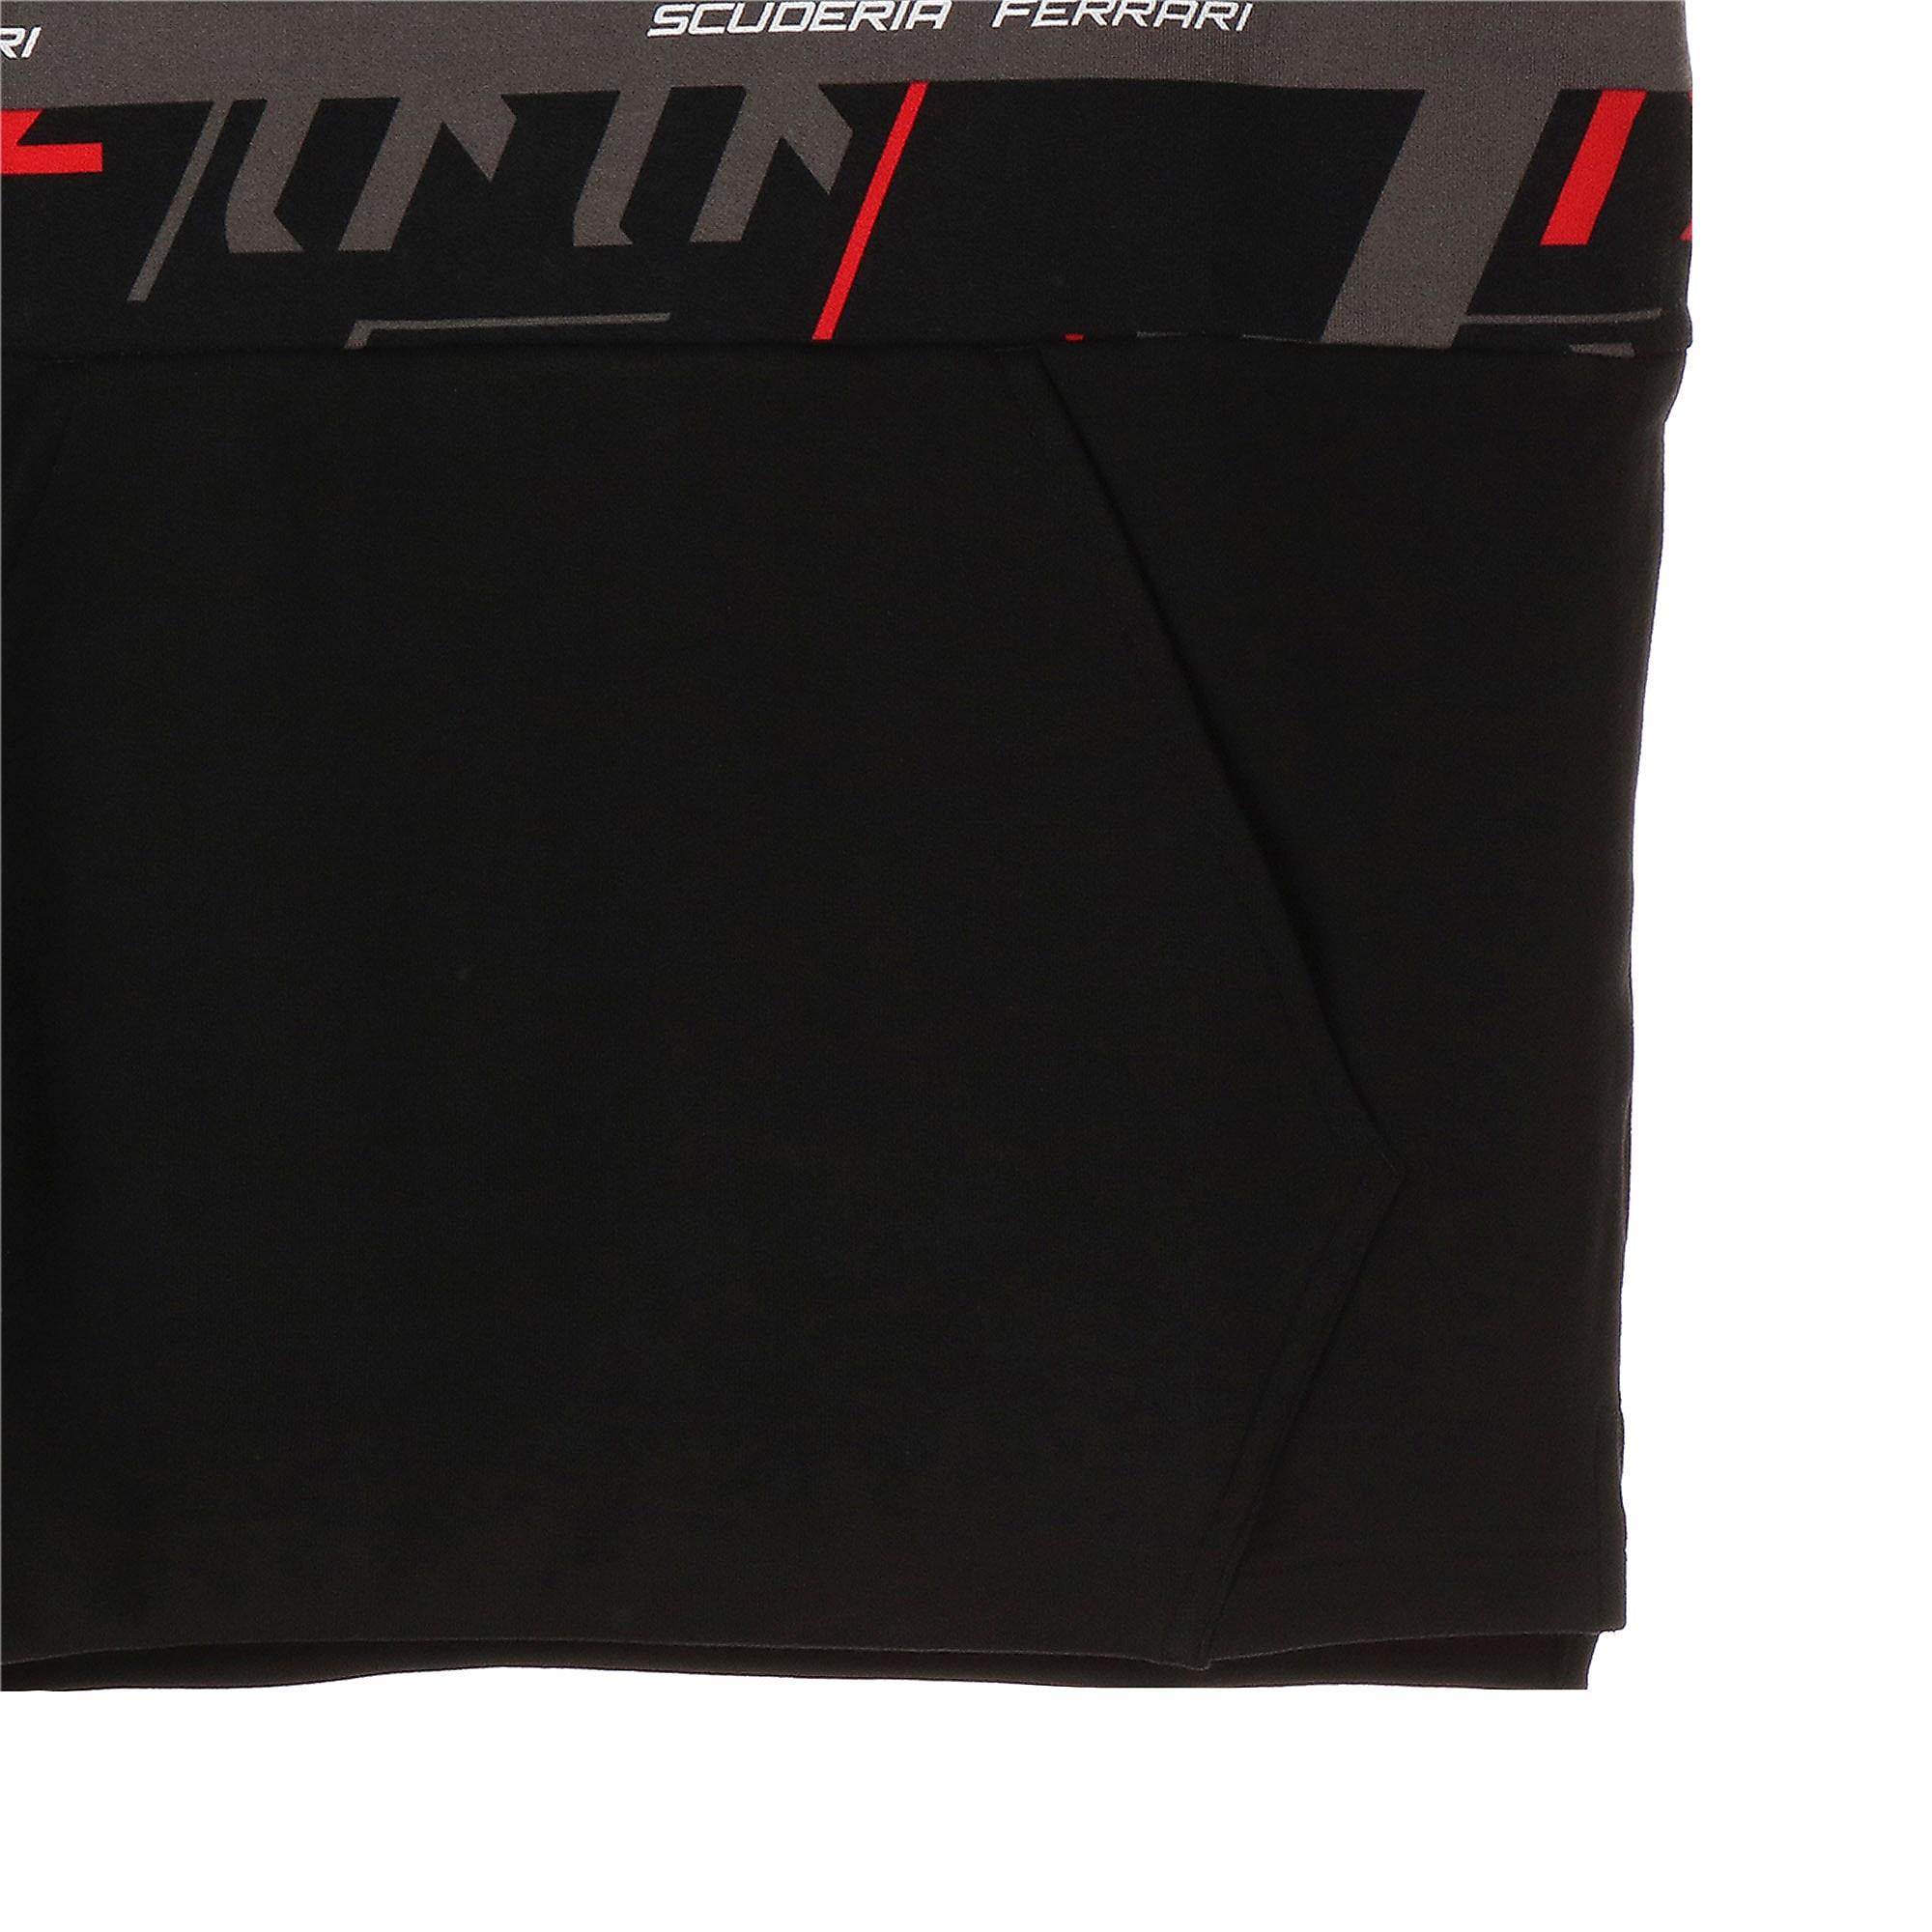 Thumbnail 5 of フェラーリ ストリート フーディー, Puma Black, medium-JPN